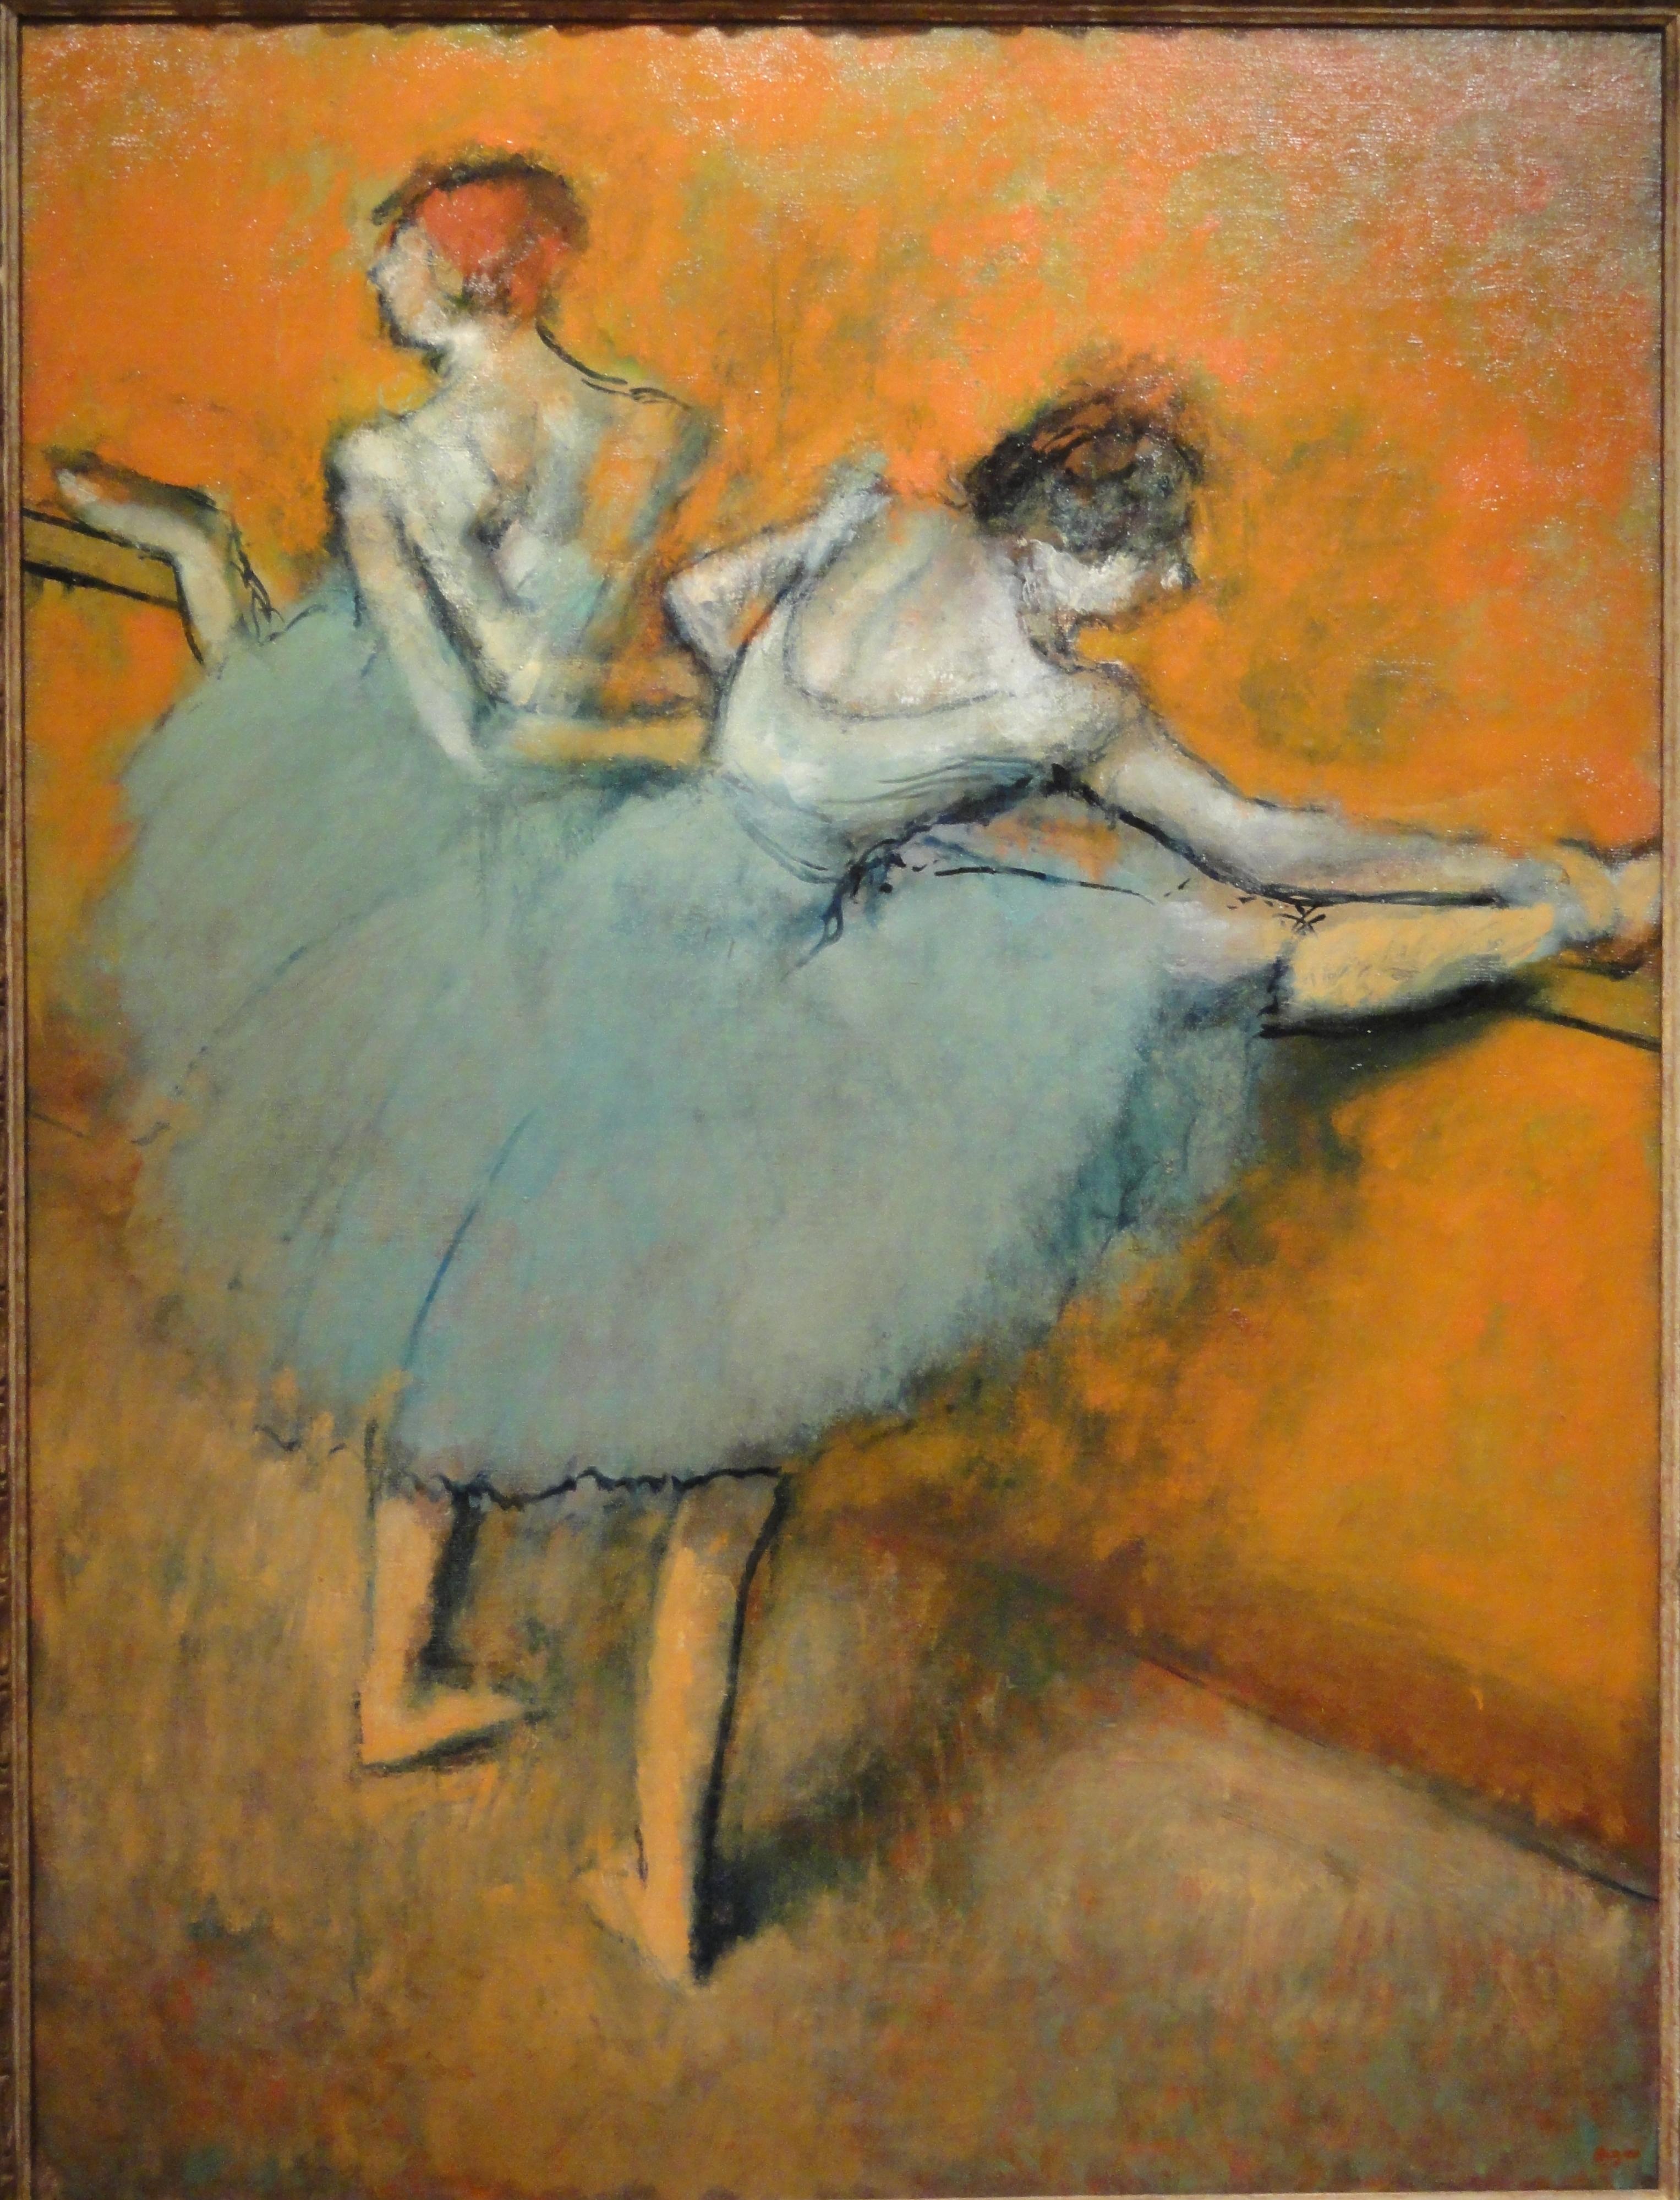 File:Edgar Germain Hilaire Degas 007.jpg - Wikimedia Commons